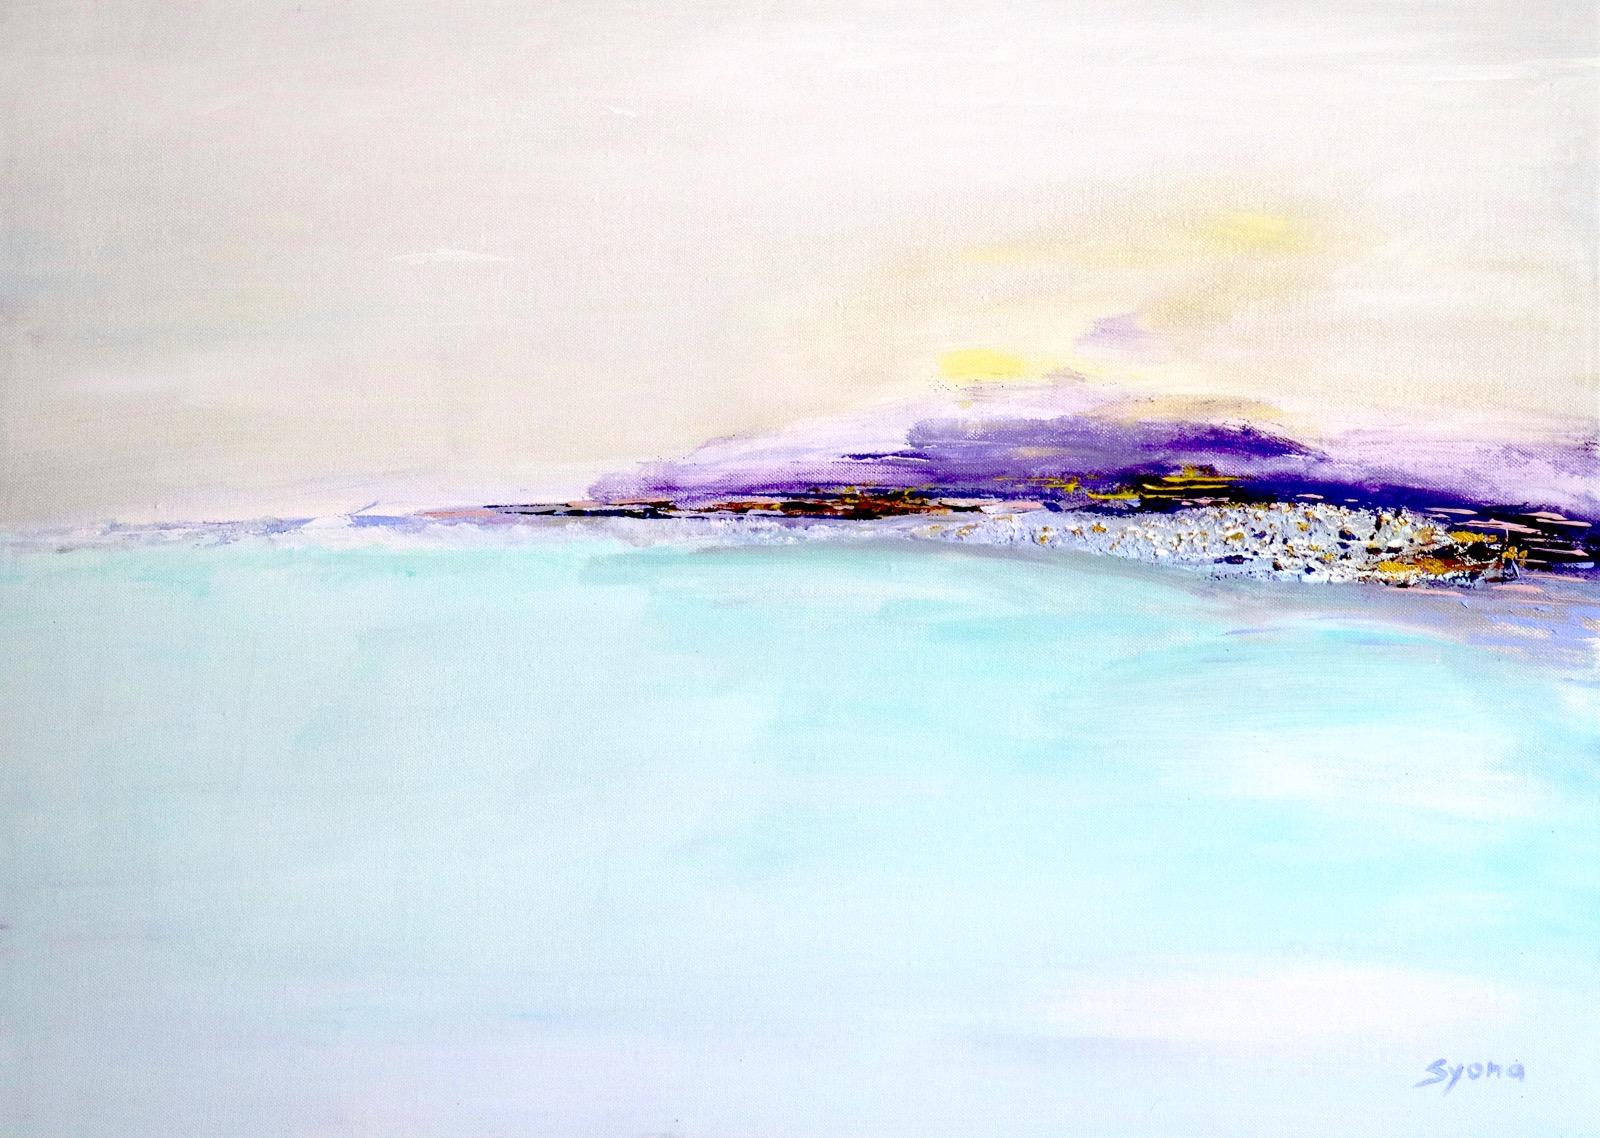 Syona at ONLY-abstract